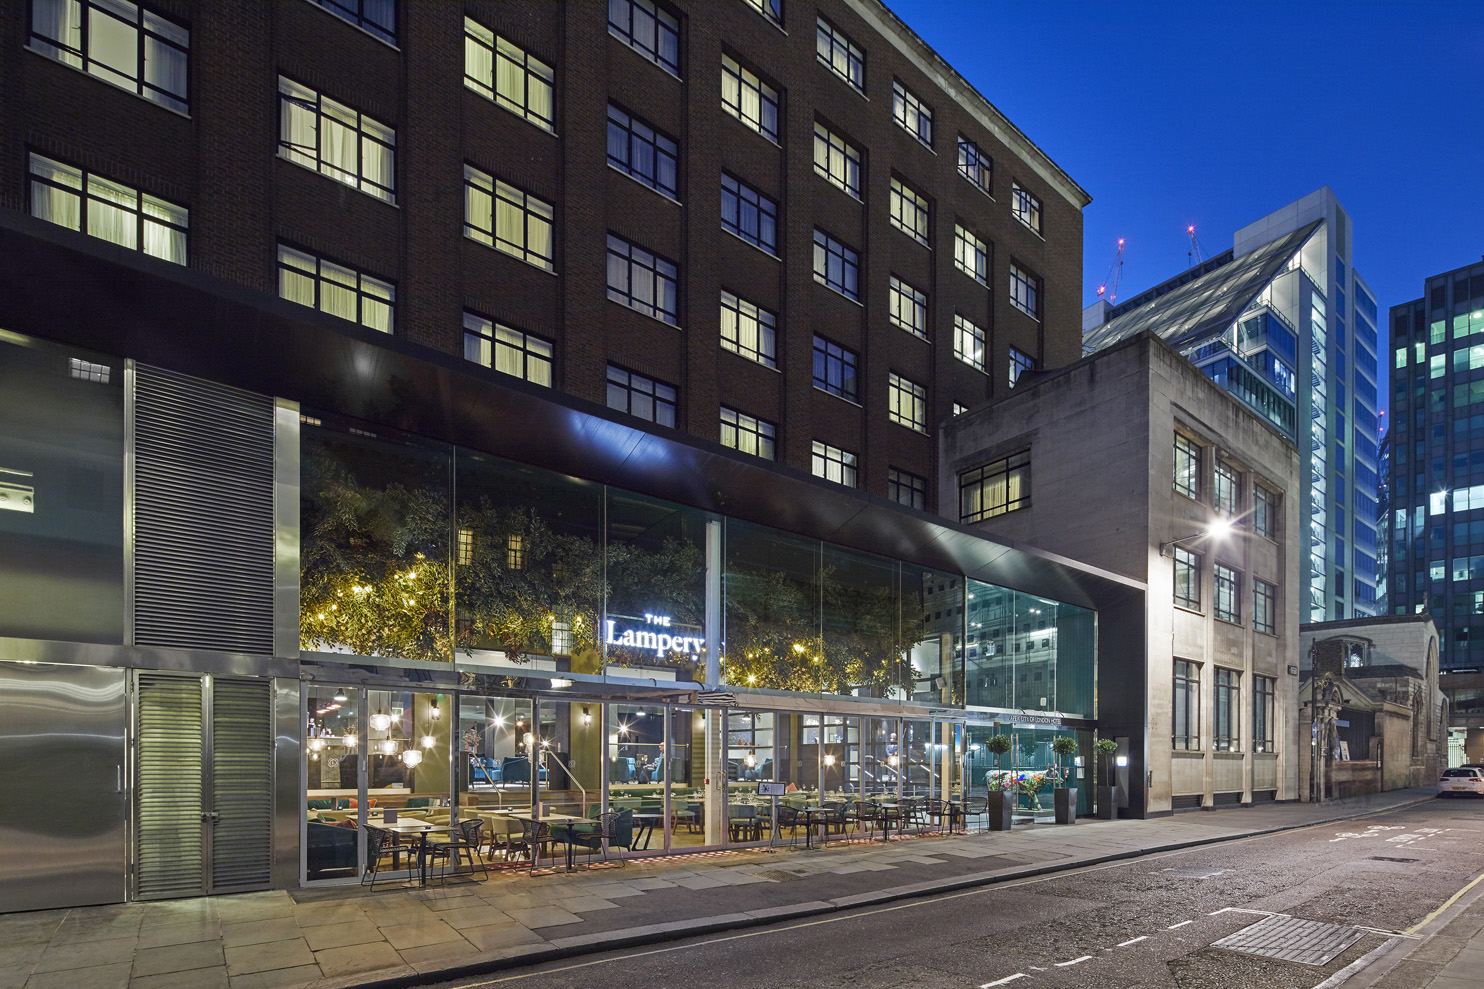 Tbc Hotel London